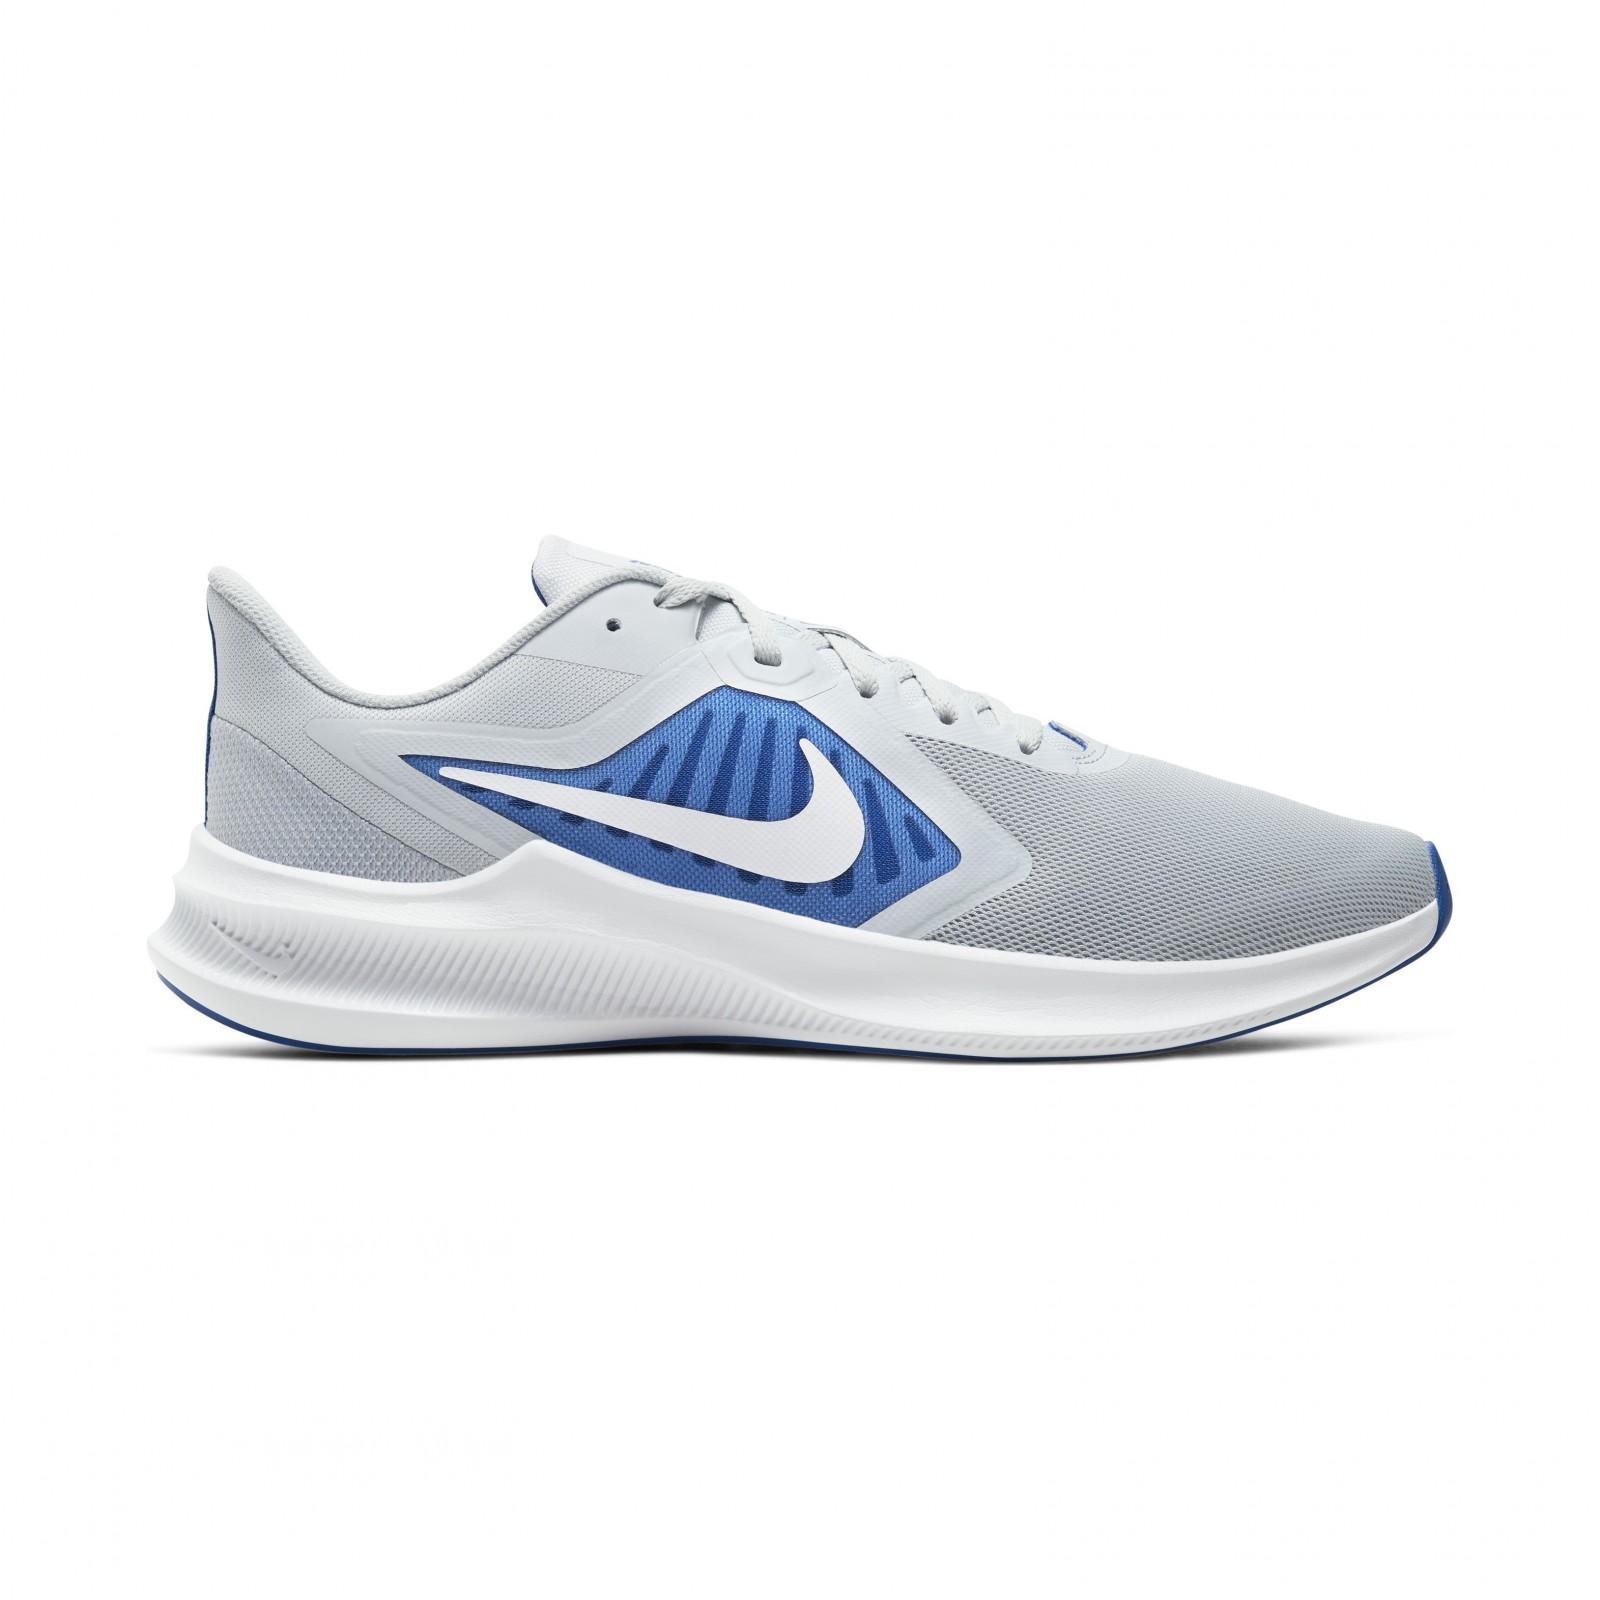 Nike downshifter 10 PURE PLATINUM/WHITE-HYPER ROYAL